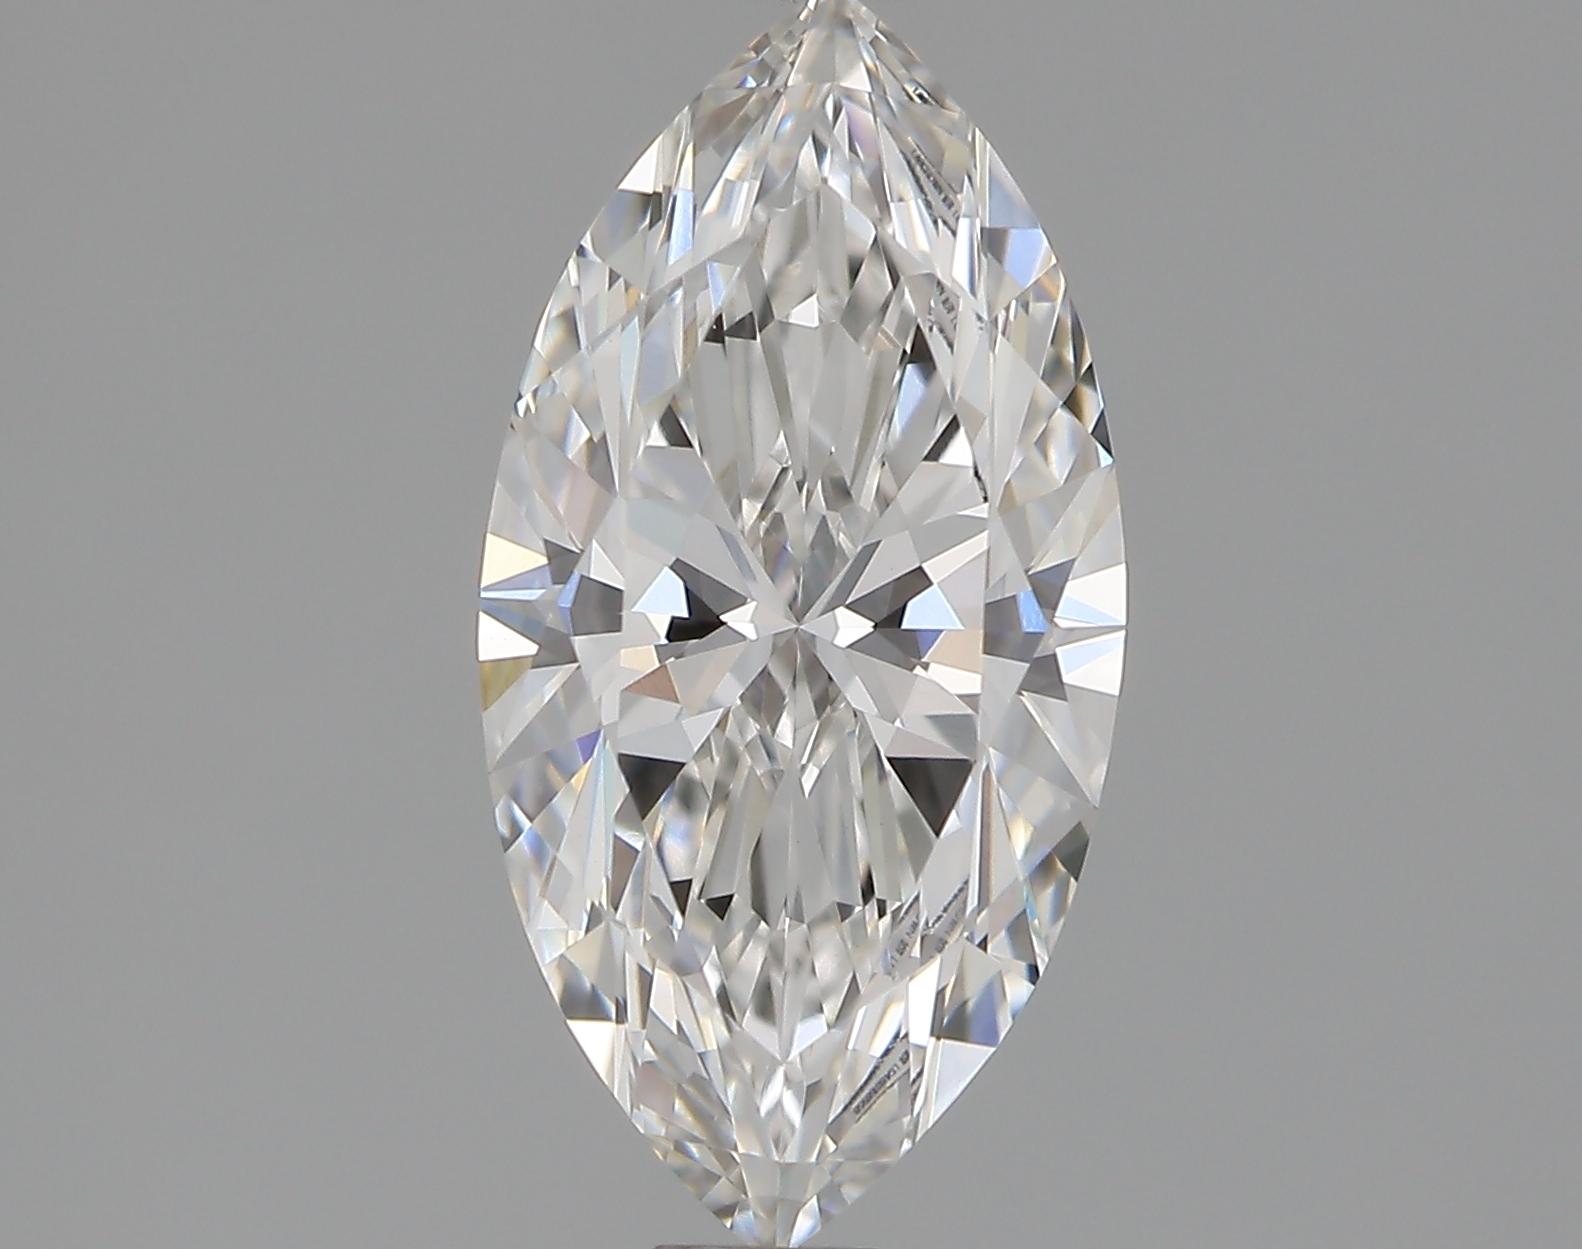 1.03 Carat F-VVS2 Ideal Marquise Diamond